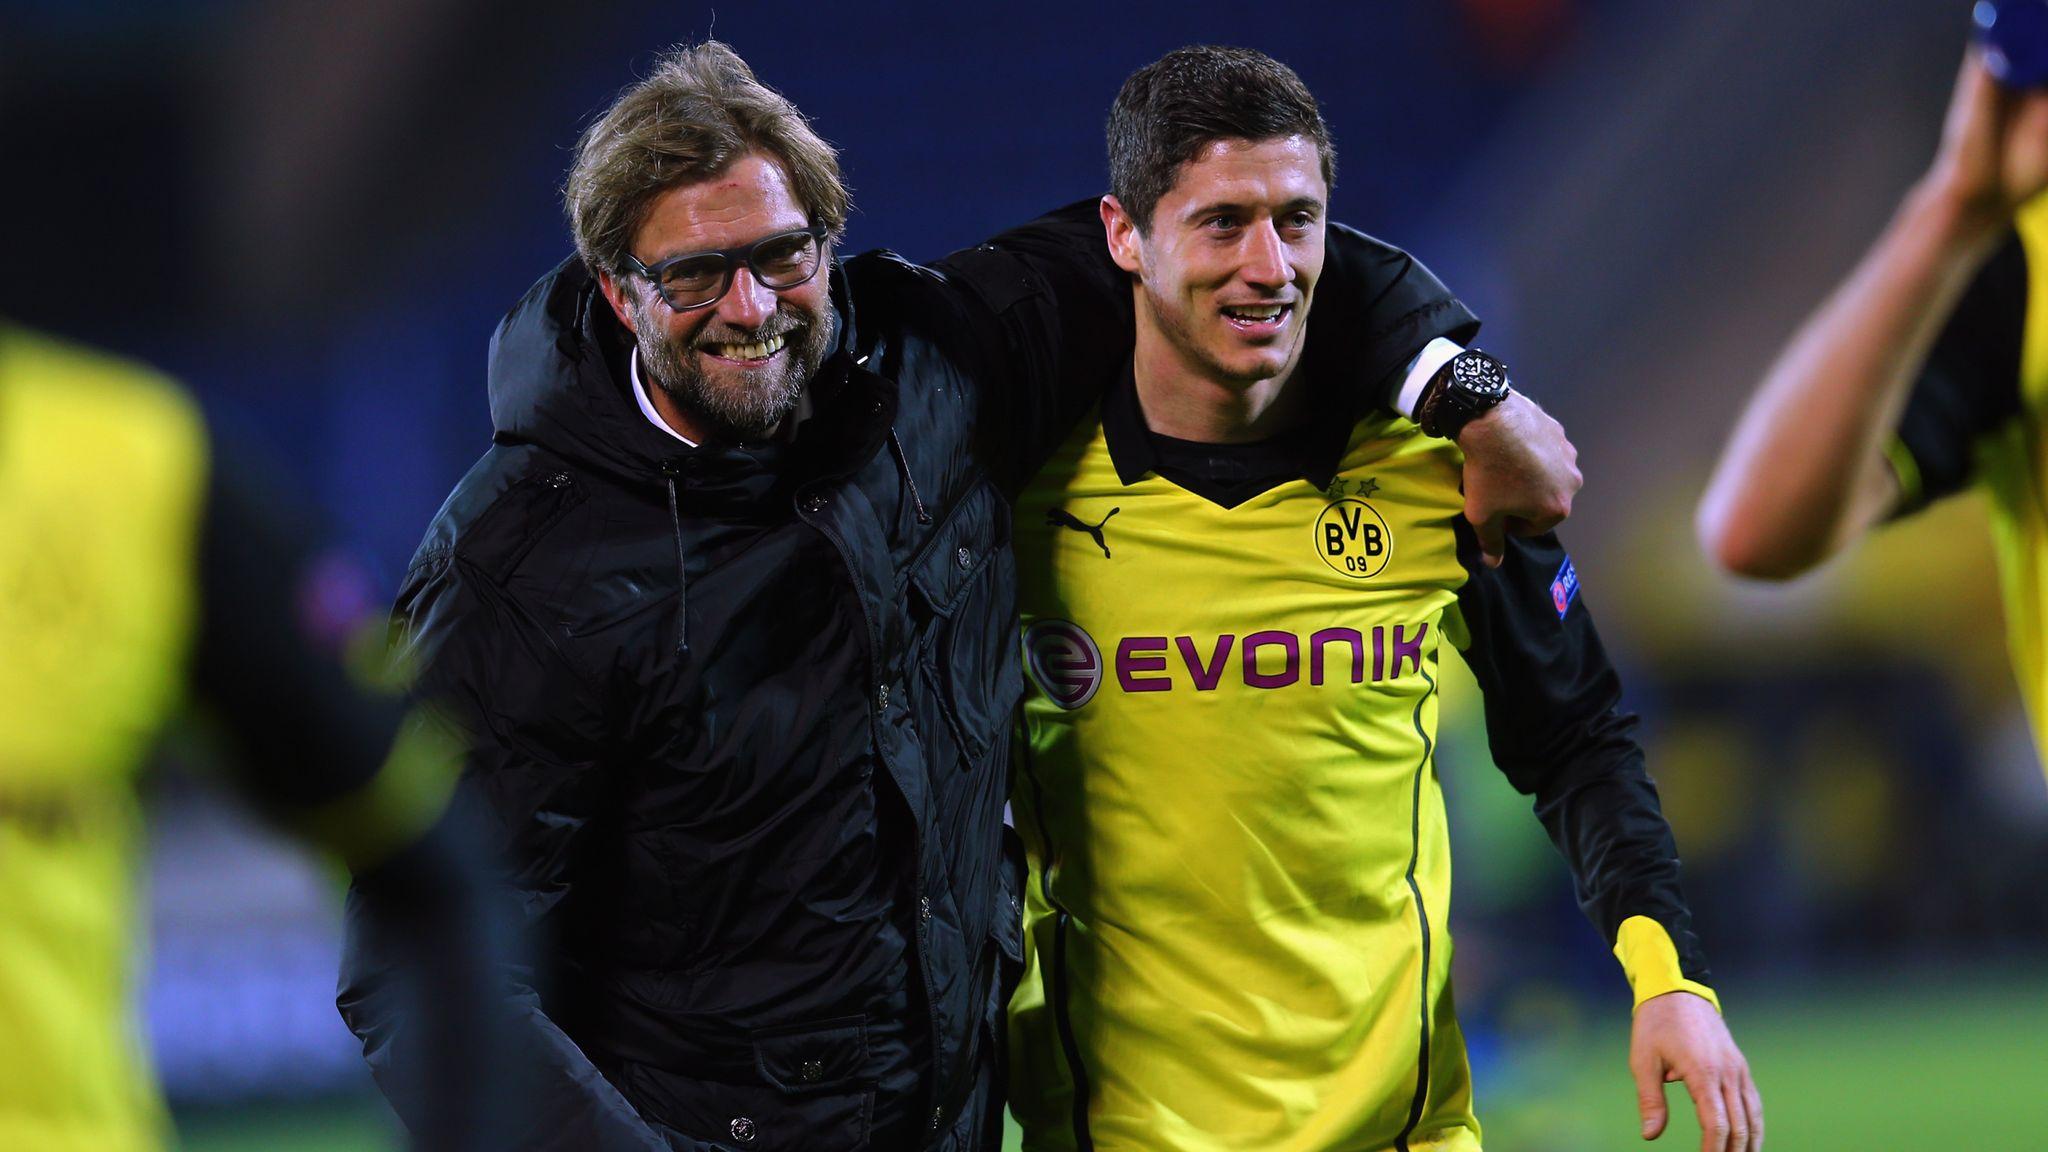 Jurgen Klopp's Borussia Dortmund days remembered ahead of Liverpool